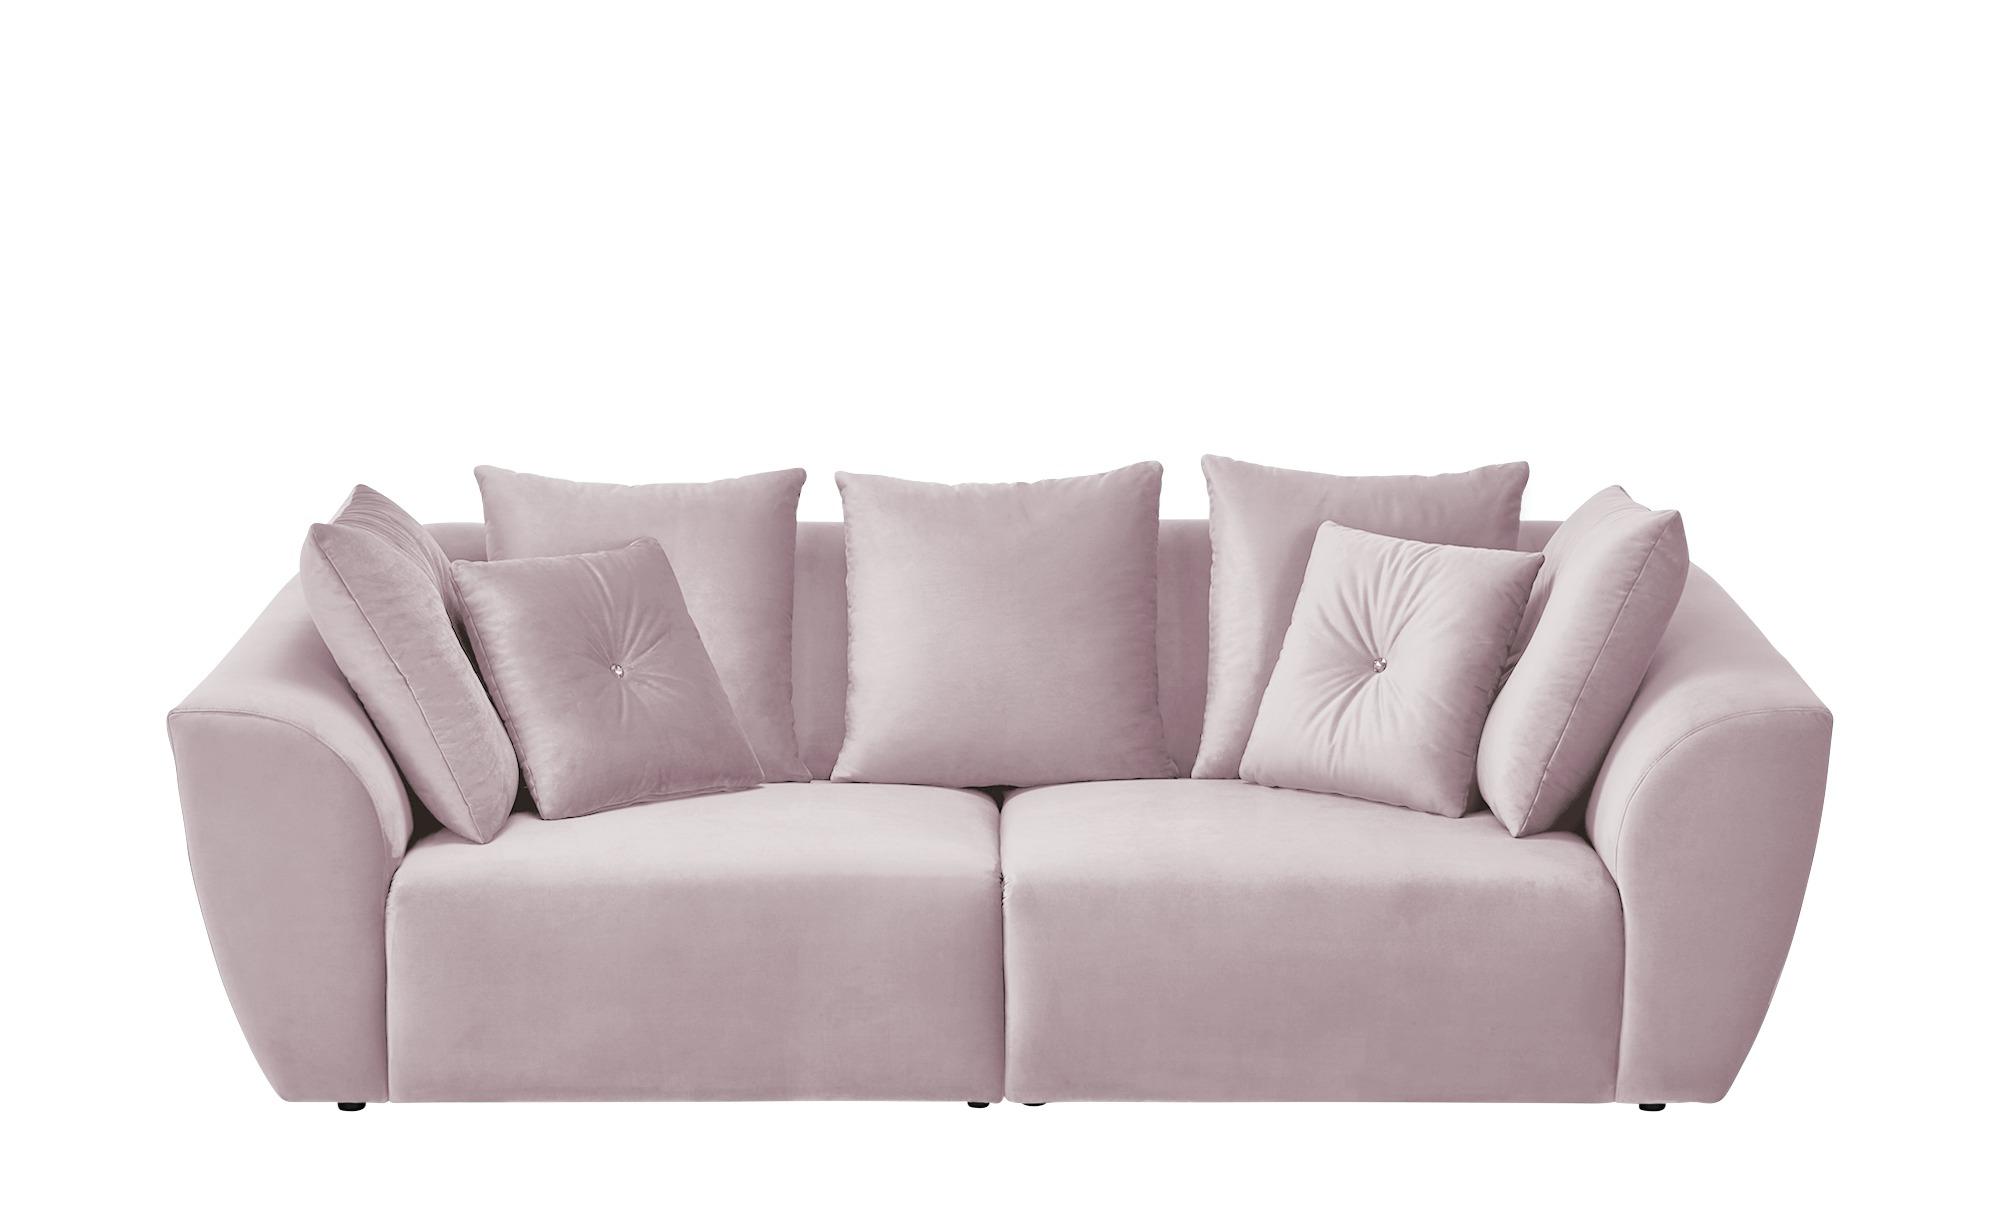 smart Big Sofa  Krista ¦ rosa/pink ¦ Maße (cm): B: 255 H: 85 T: 125 Polstermöbel > Sofas > Big-Sofas - Höffner